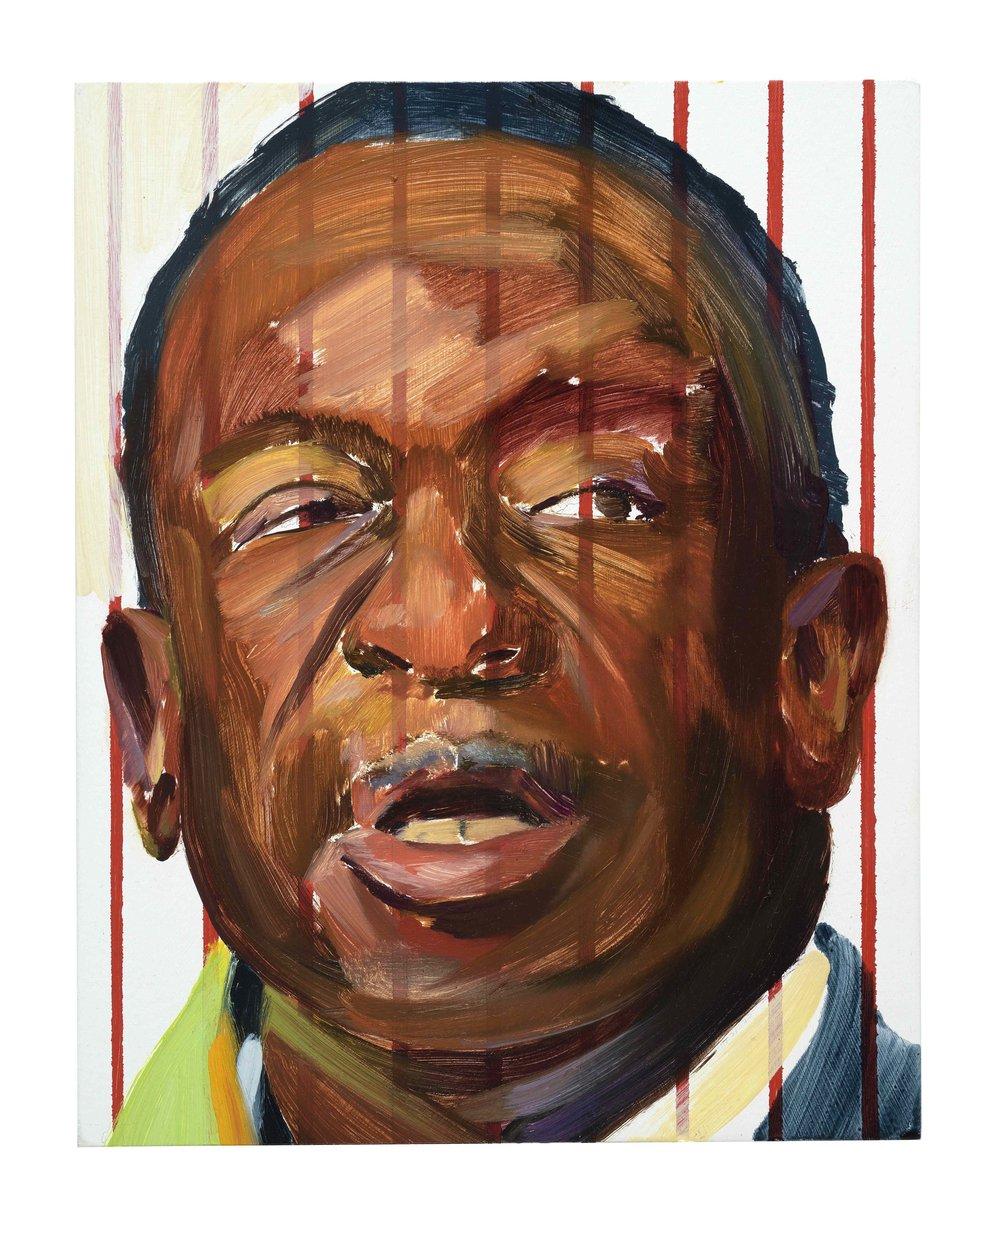 The new president(Crocodile), 2018, oil on wood, 25x20cm